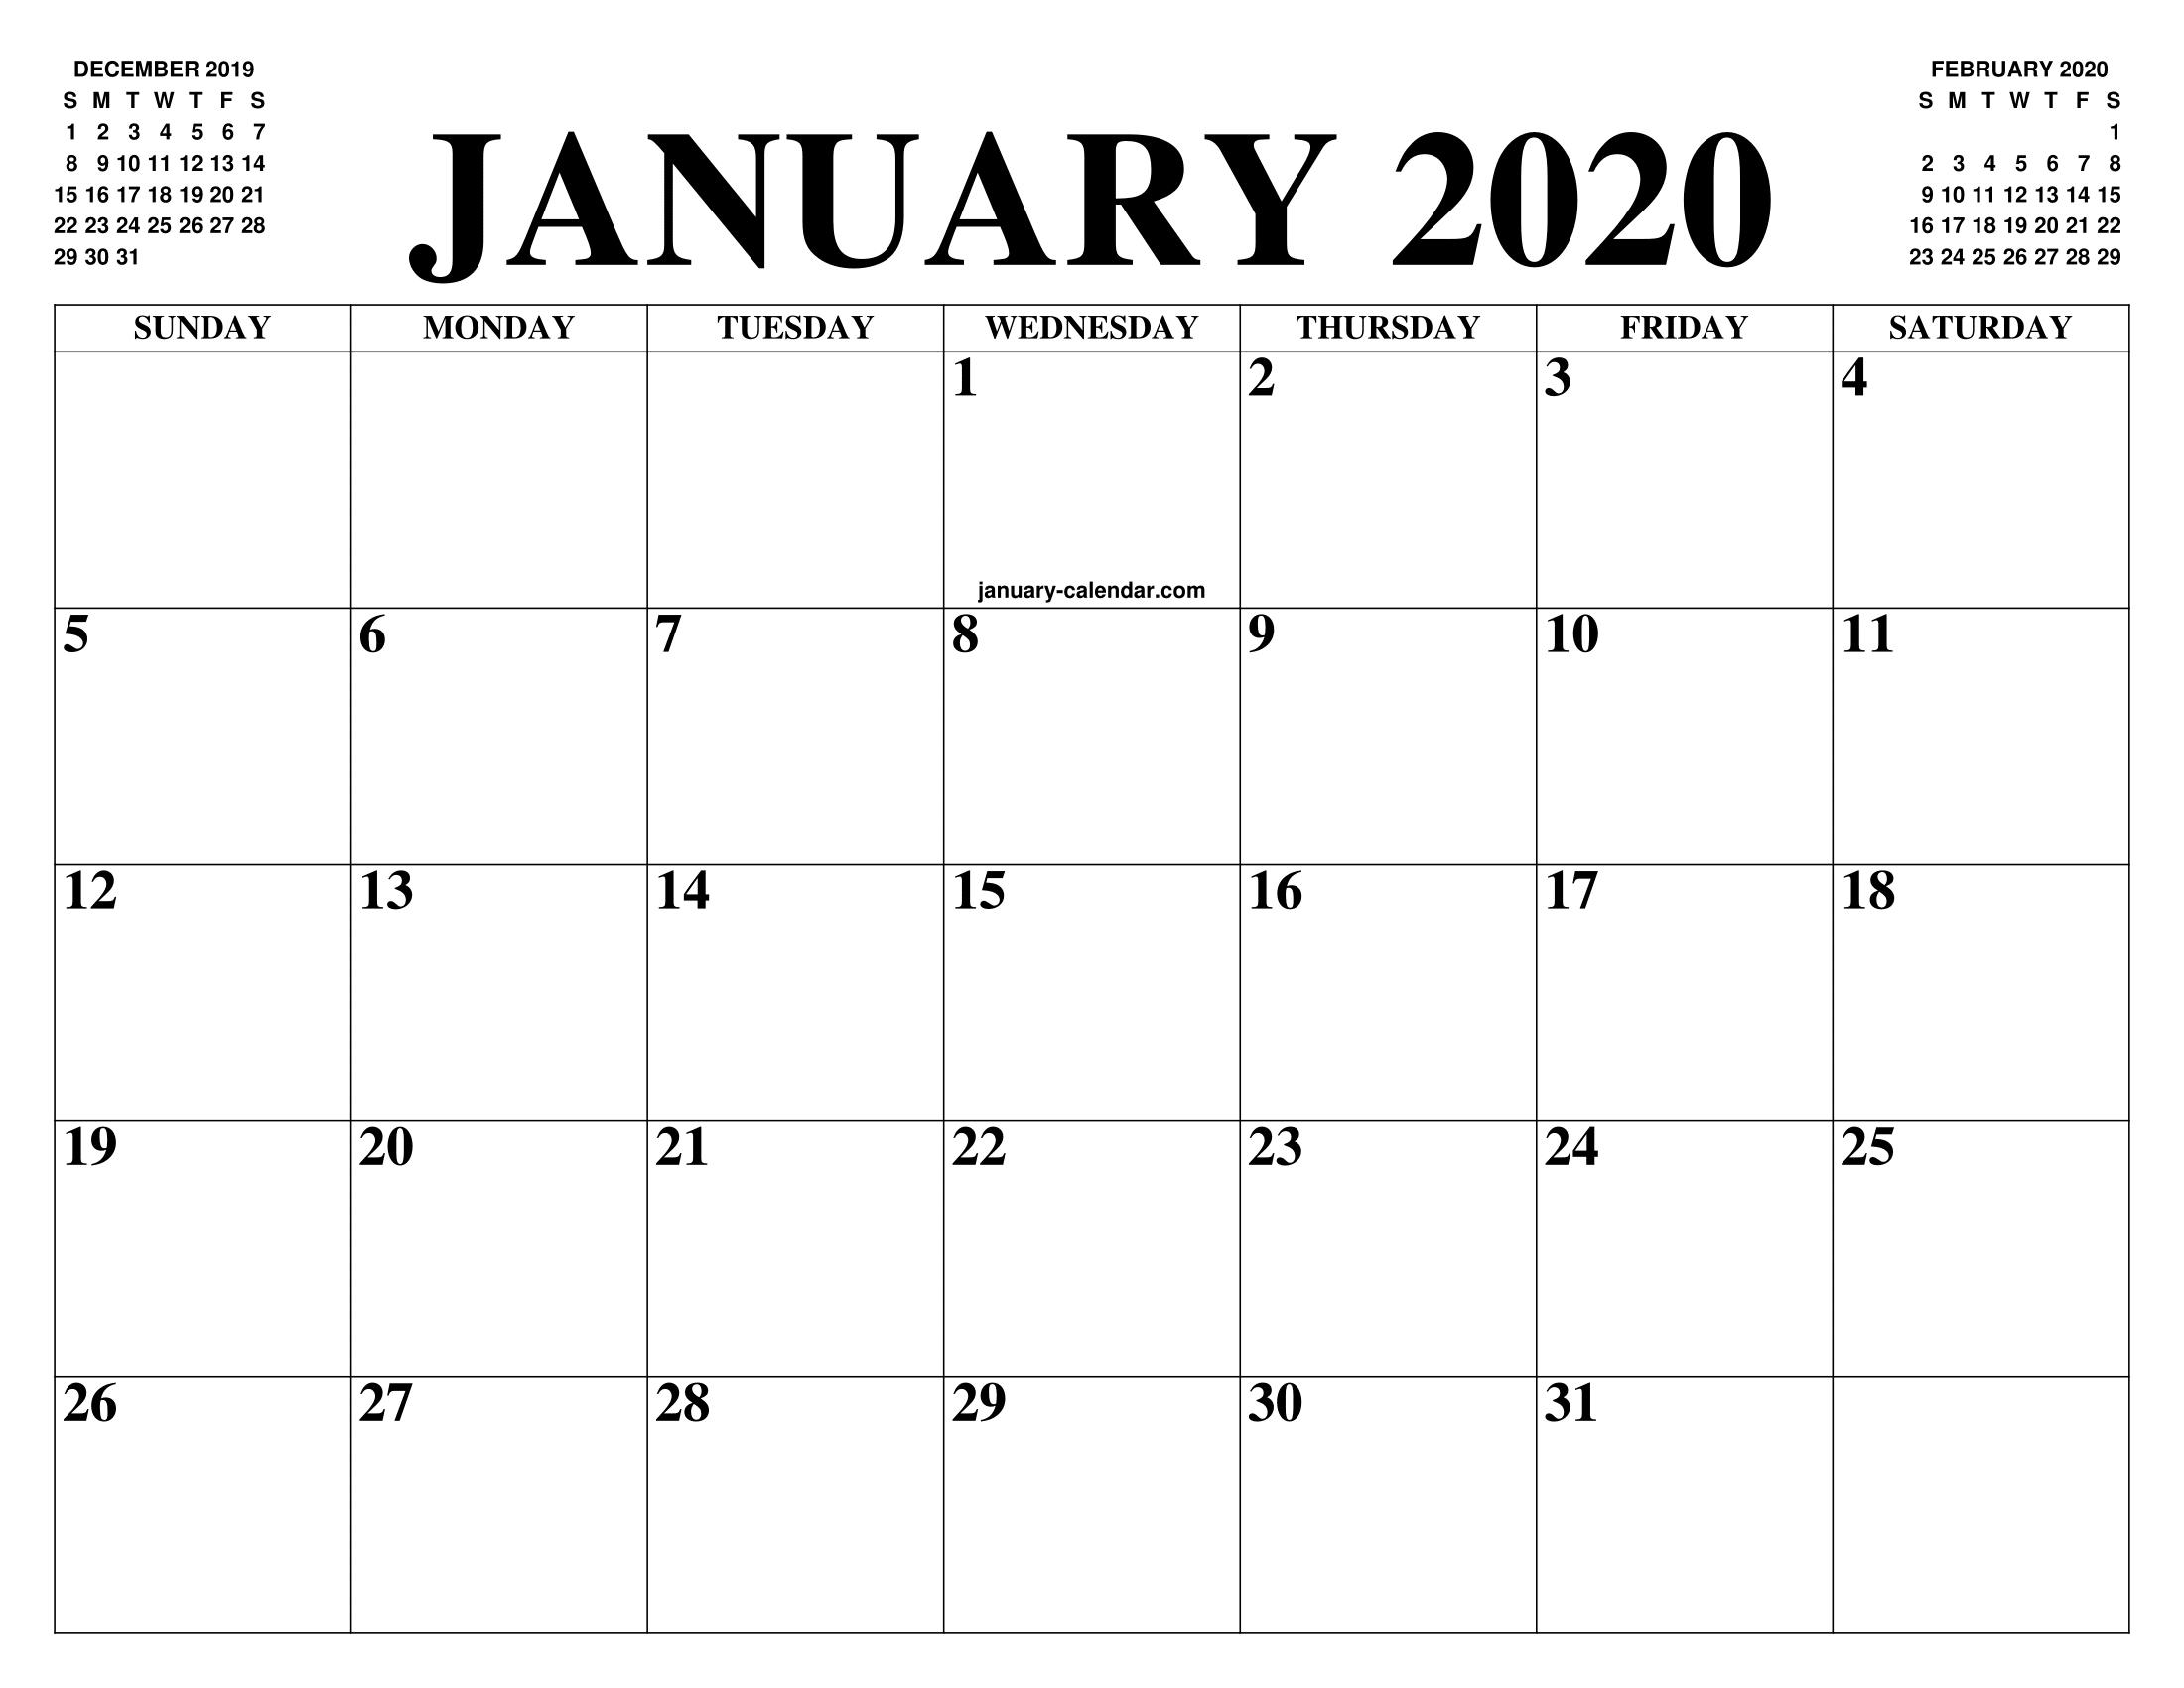 December 2020 Calender With Large Squares | Calendar in 2021 Calendar Printable Large Squares